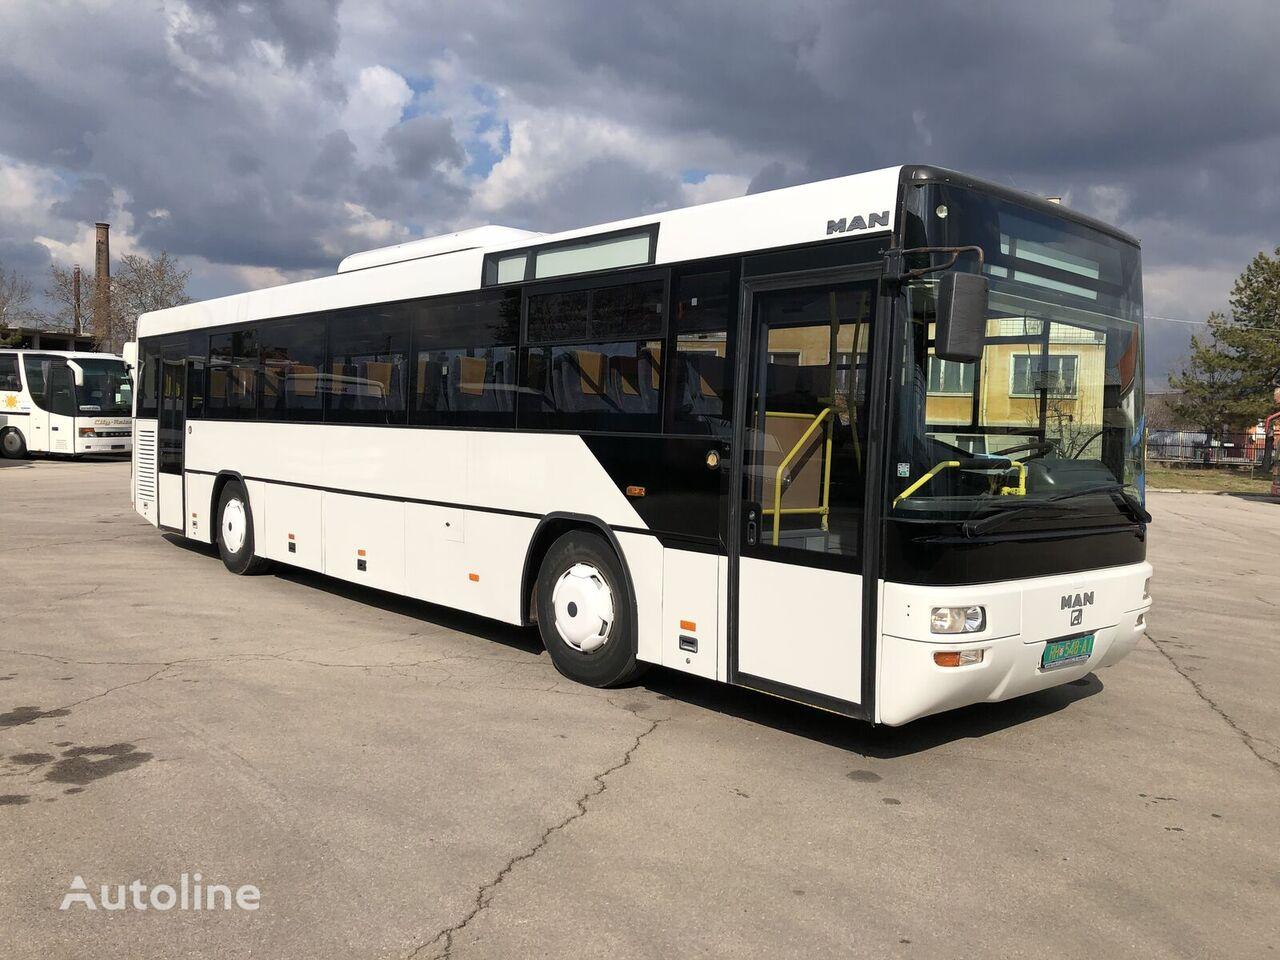 MAN 313 lion s classic a72 interurban bus